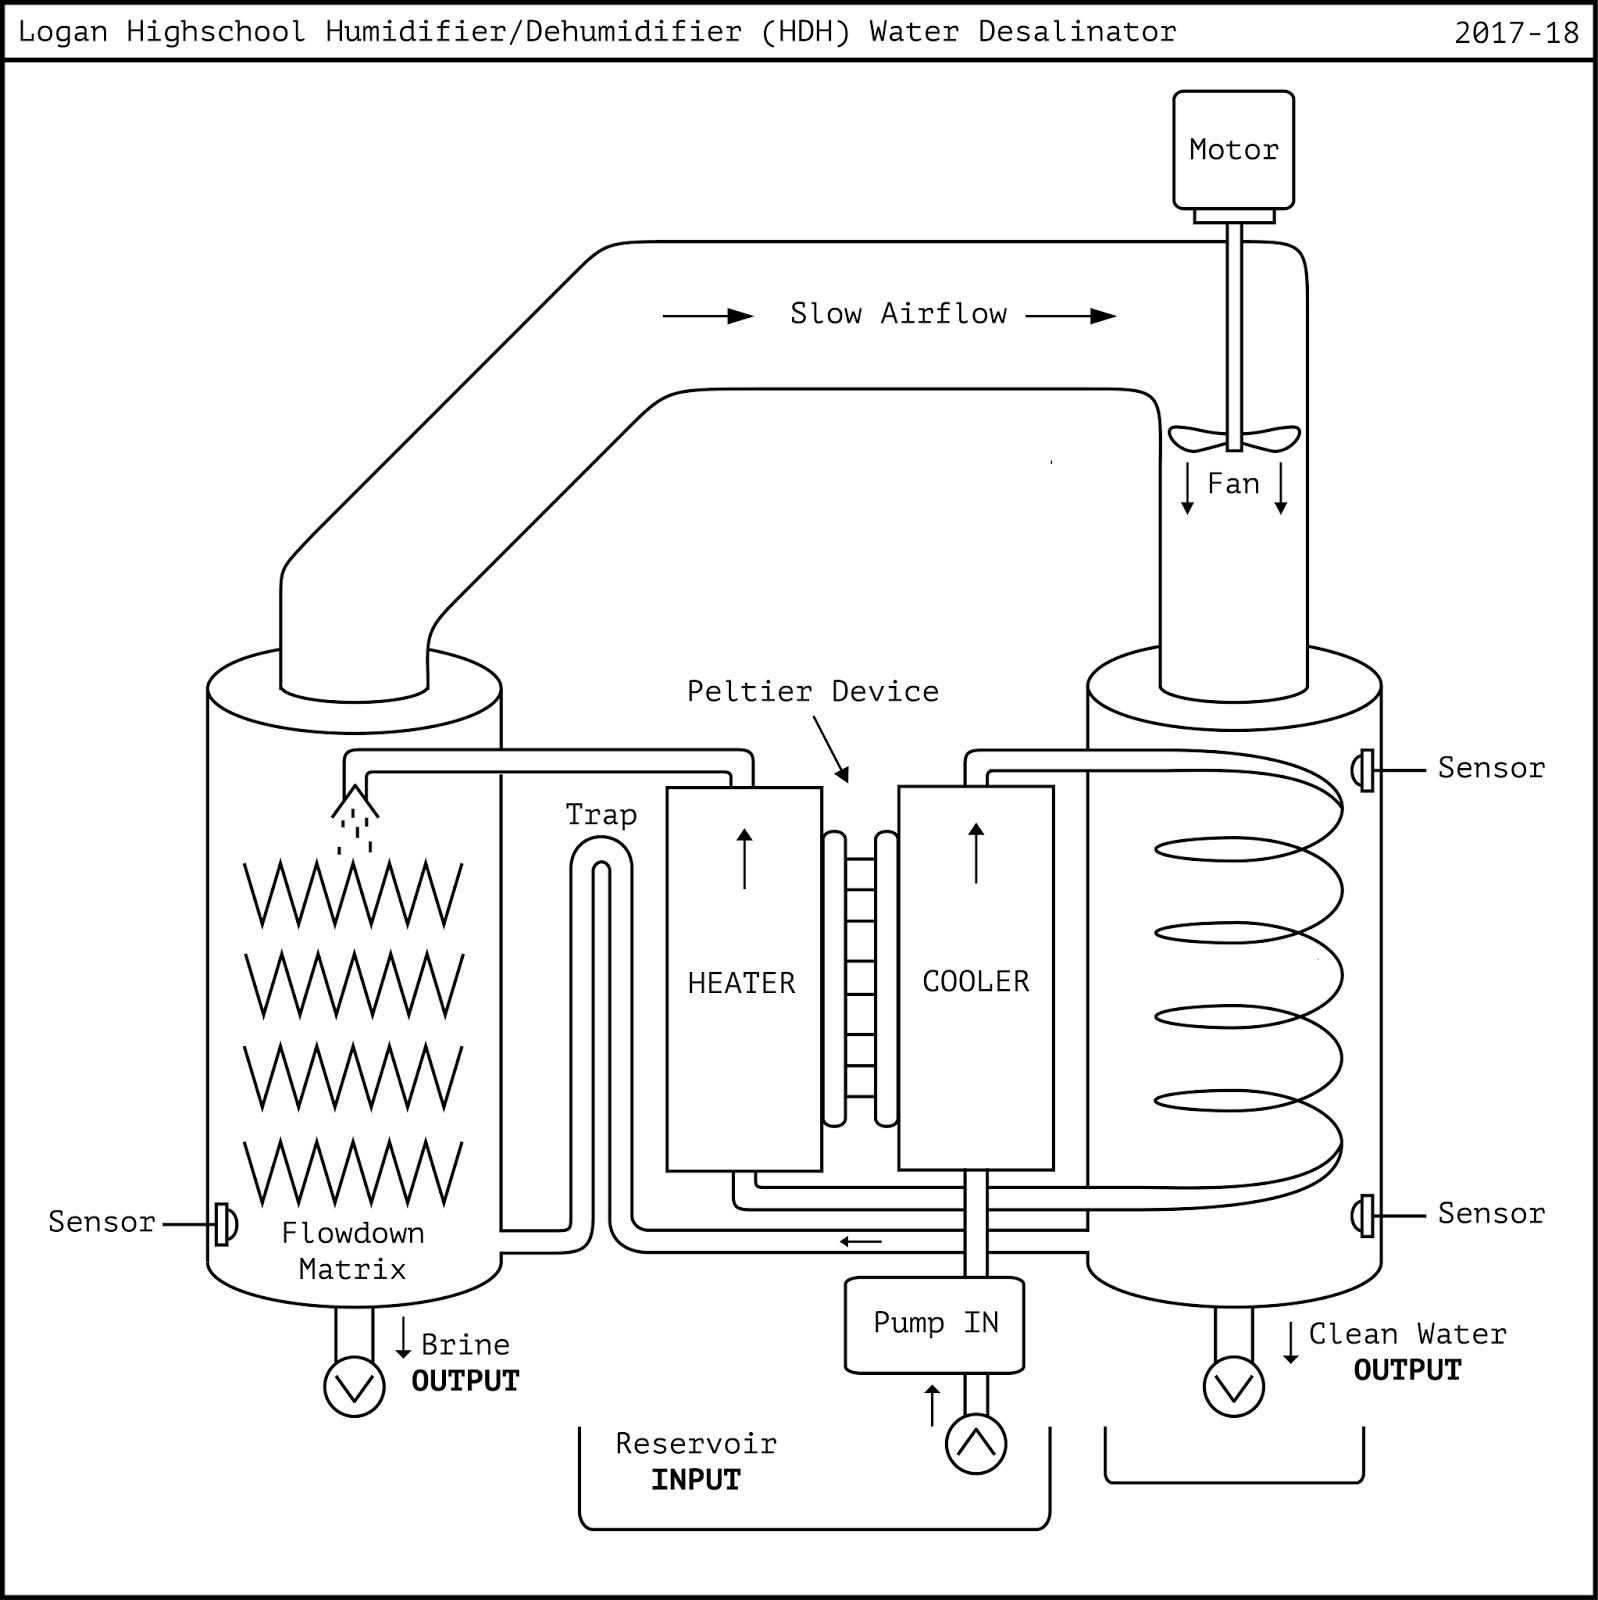 Logan Ranger Desalination Machine: Conceptual Drawing of HDH